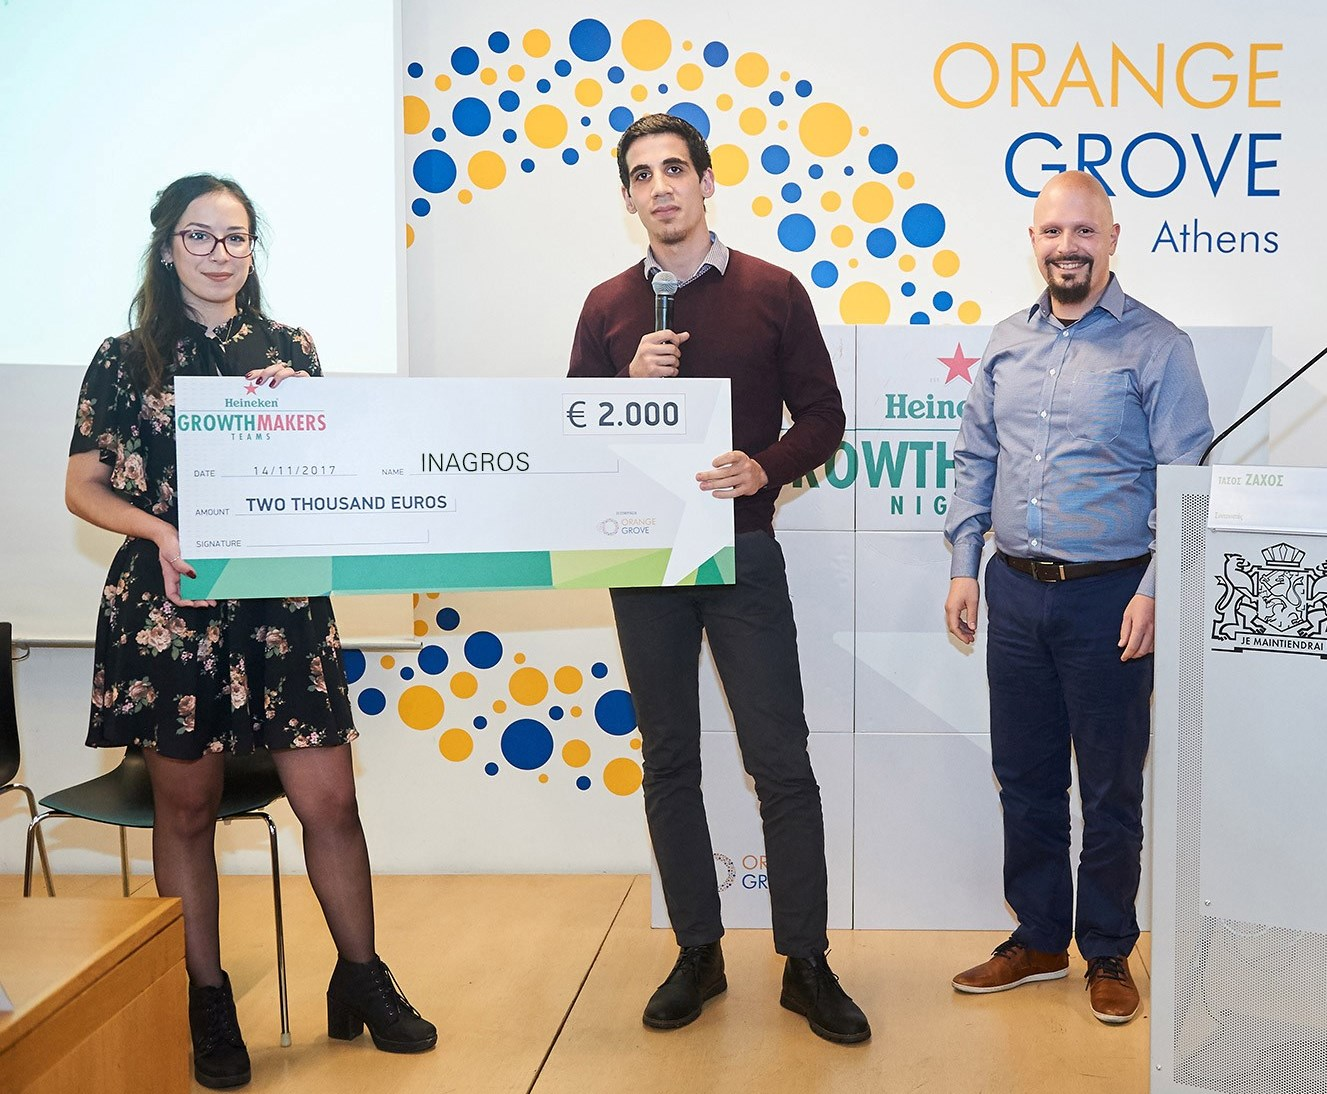 6.Inagros: νικήτρια ομάδα του επιχειρηματικού διαγωνισμού Heineken Growth Makers.